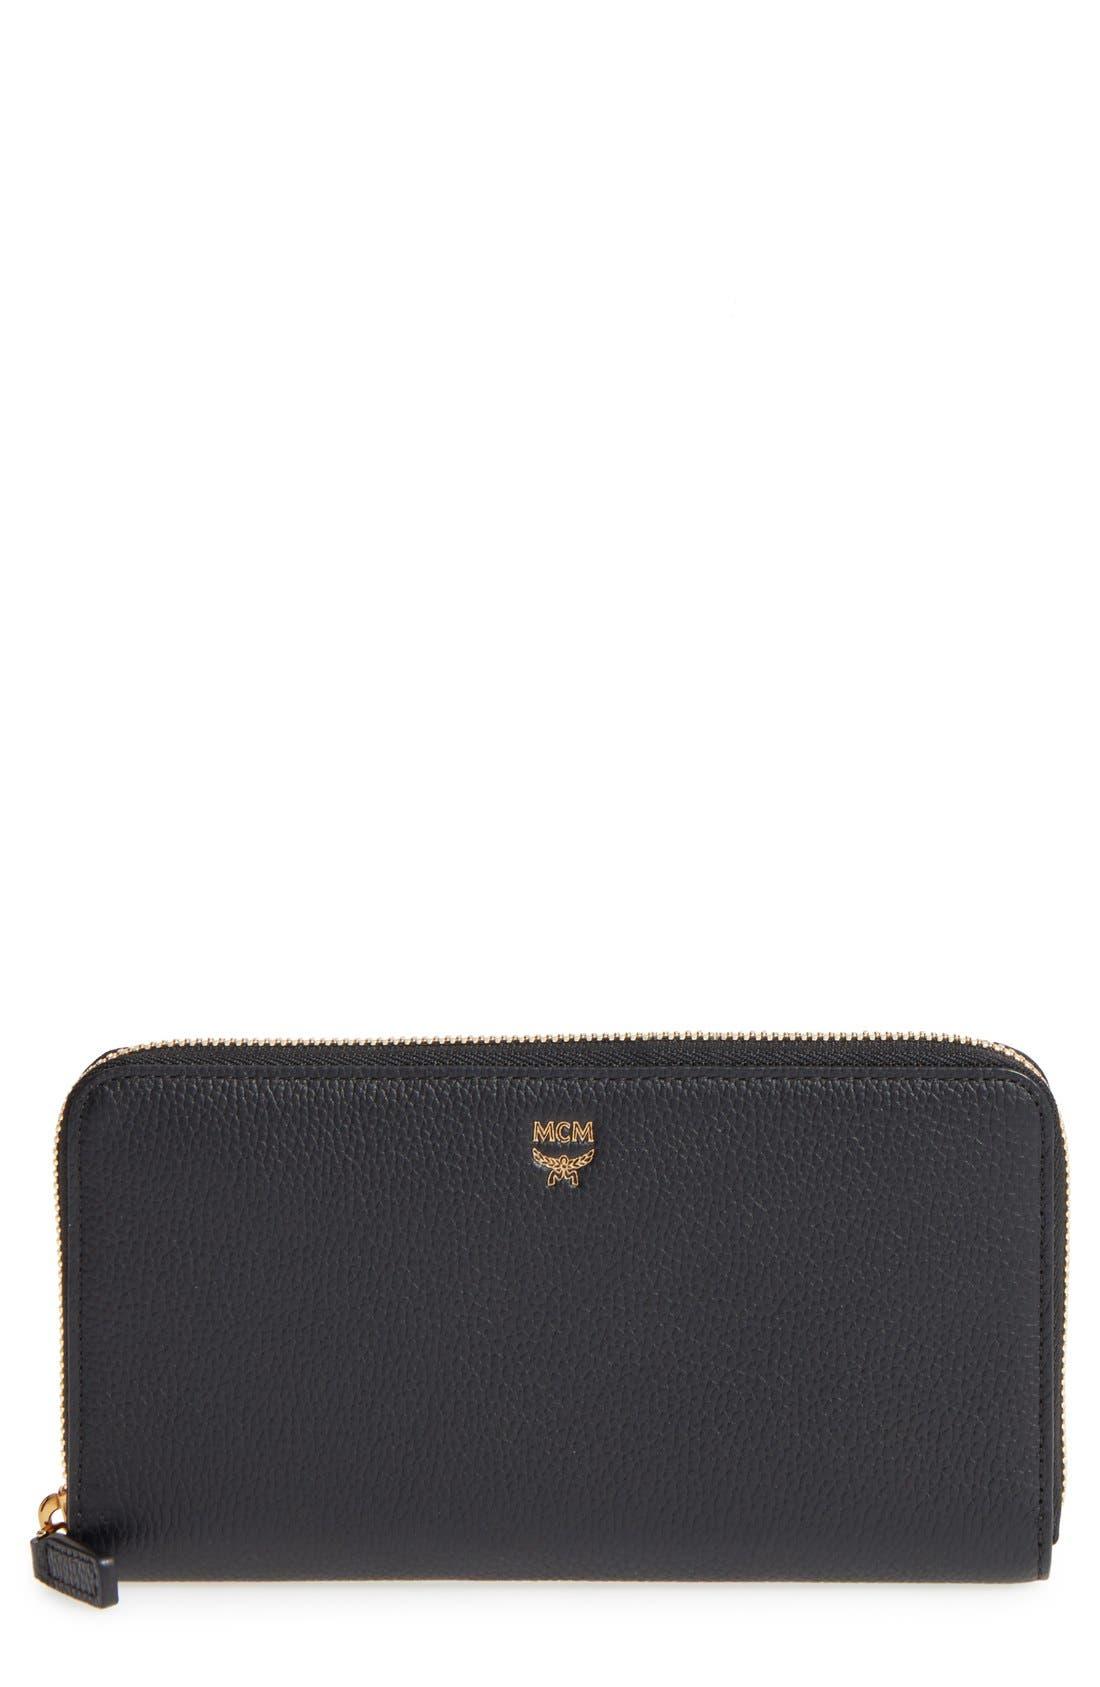 Milla Leather Zip Around Wallet,                         Main,                         color,